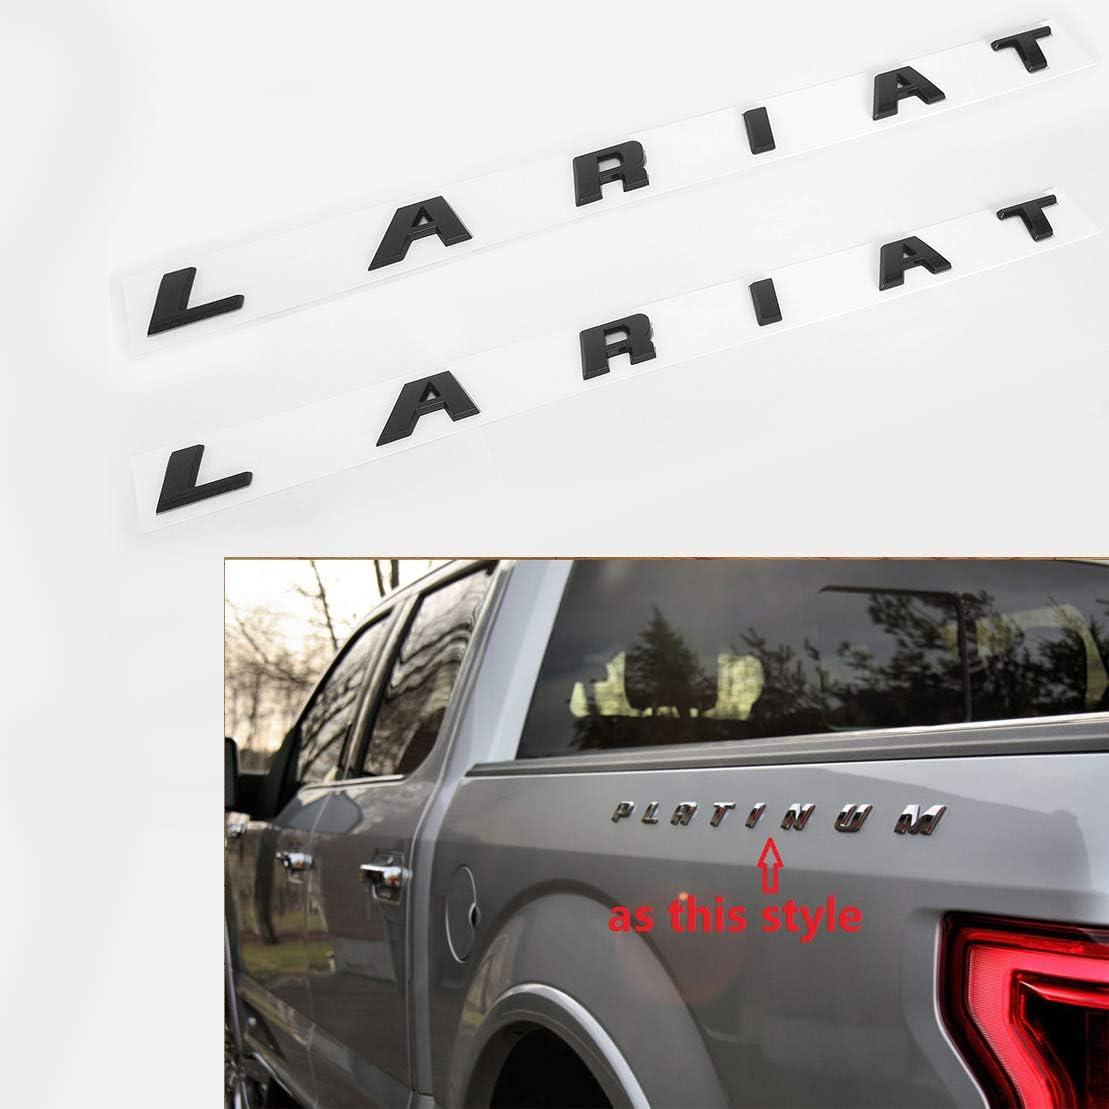 2x OEM Black Lariat Side Fender Emblems letter Lariat Badge 3D logo Replacement for F150 F250 F350 Lariat